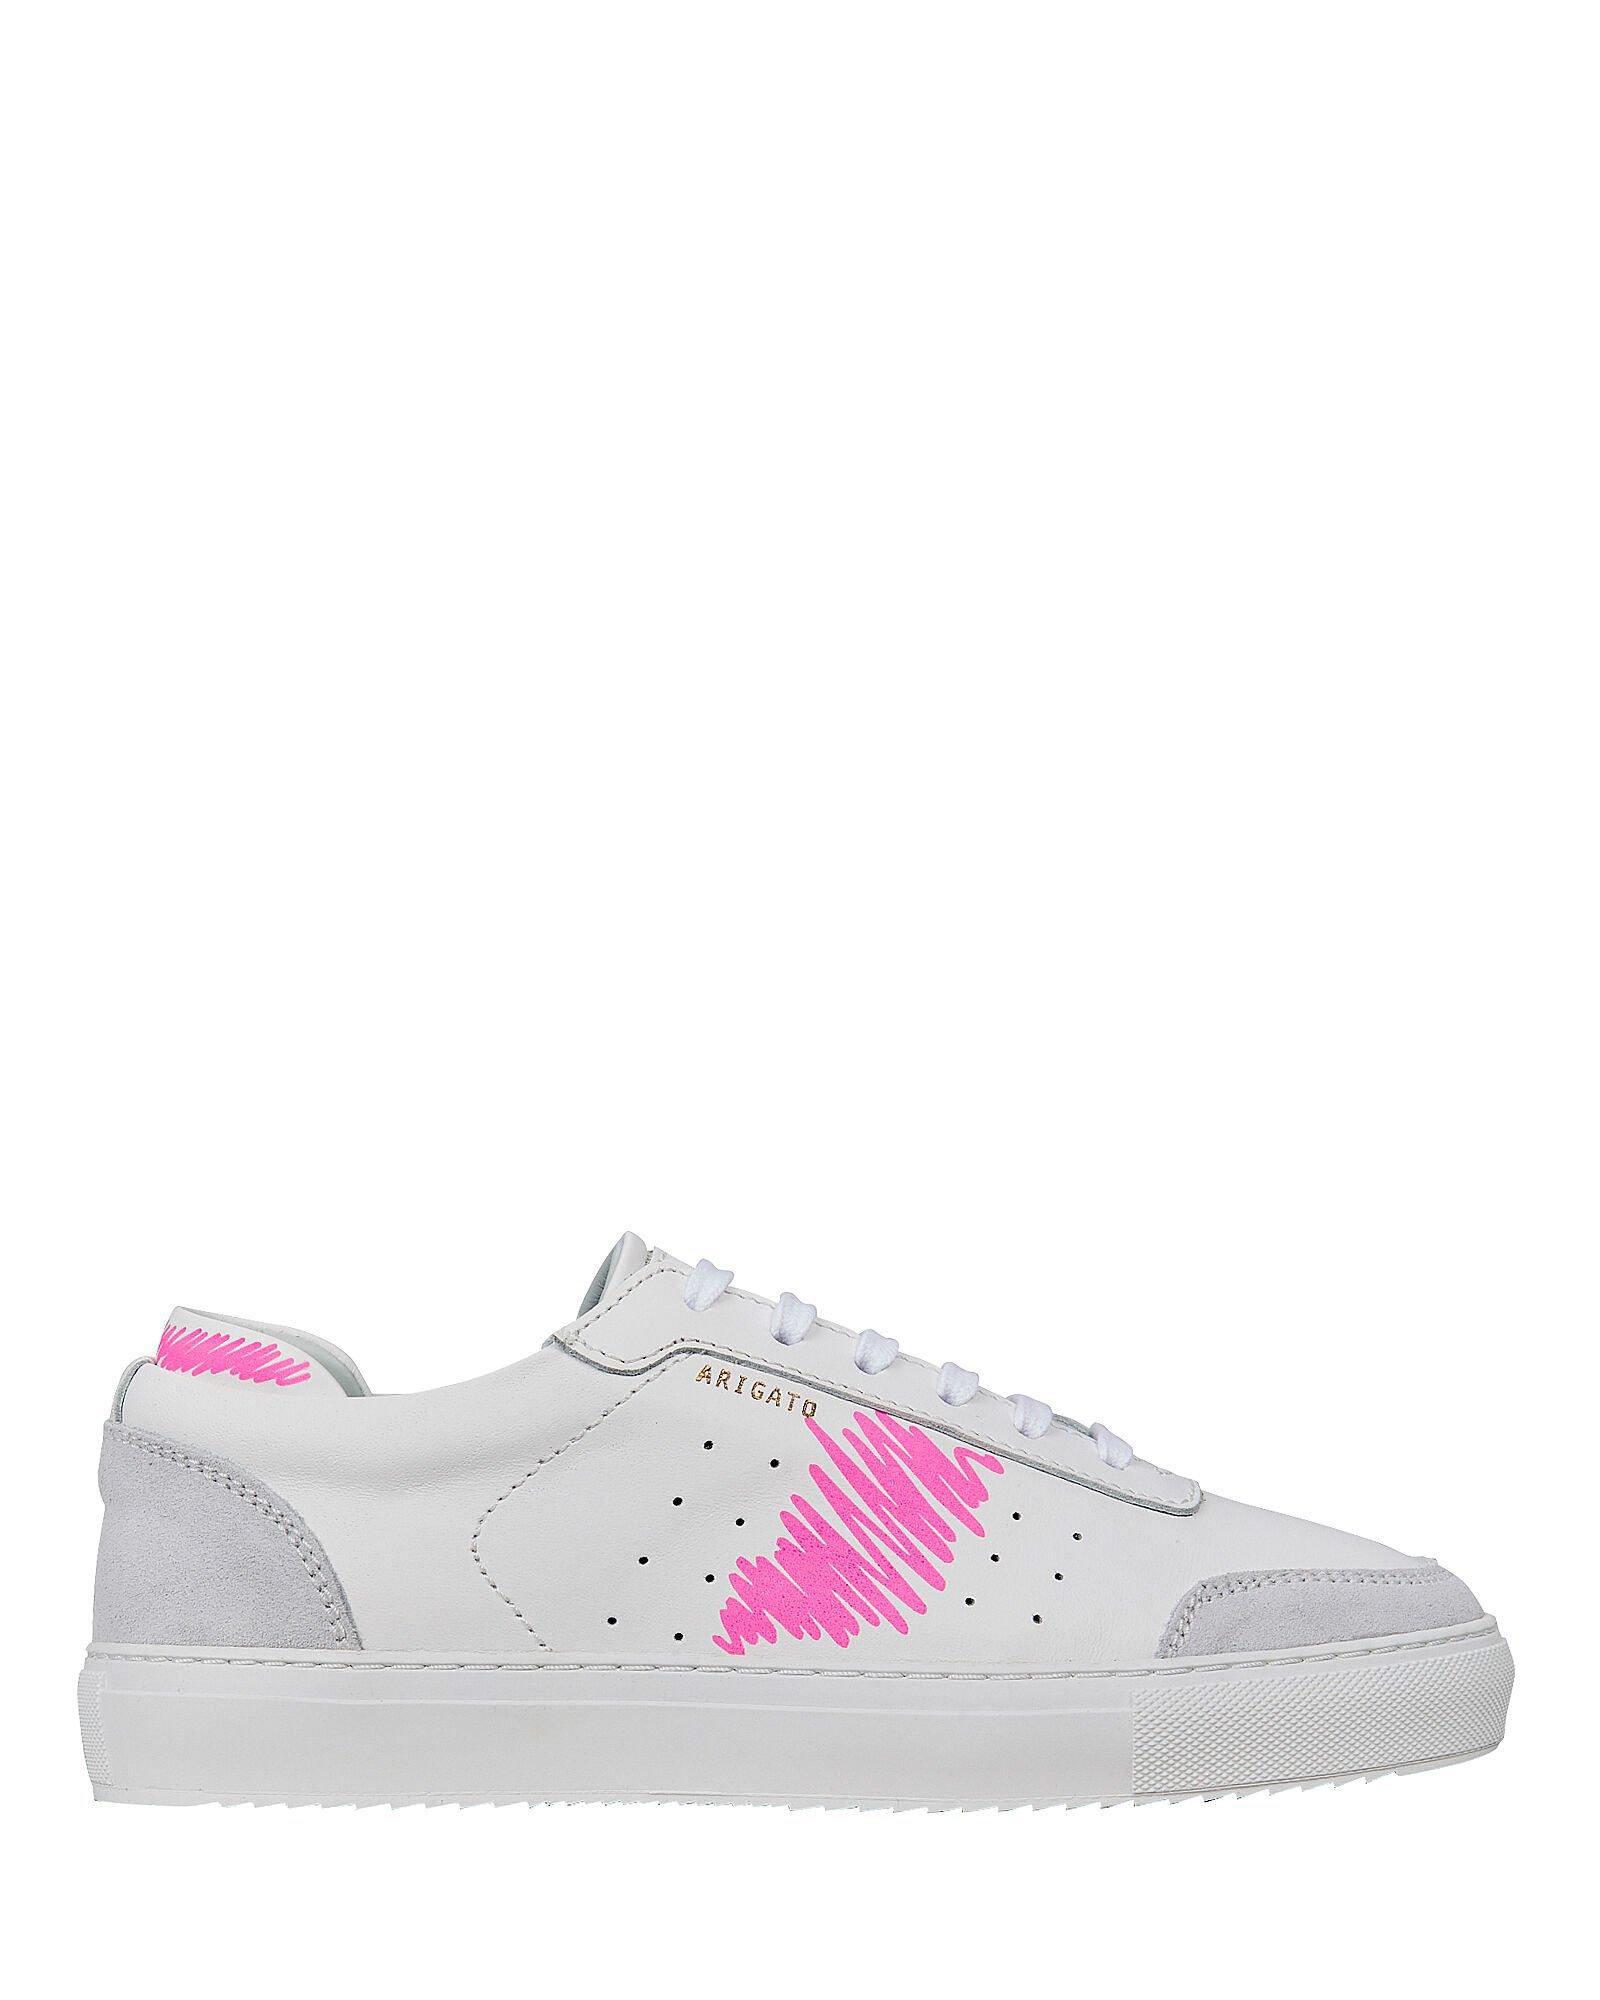 Axel Arigato | Dunk Scribble Sneakers | INTERMIX®